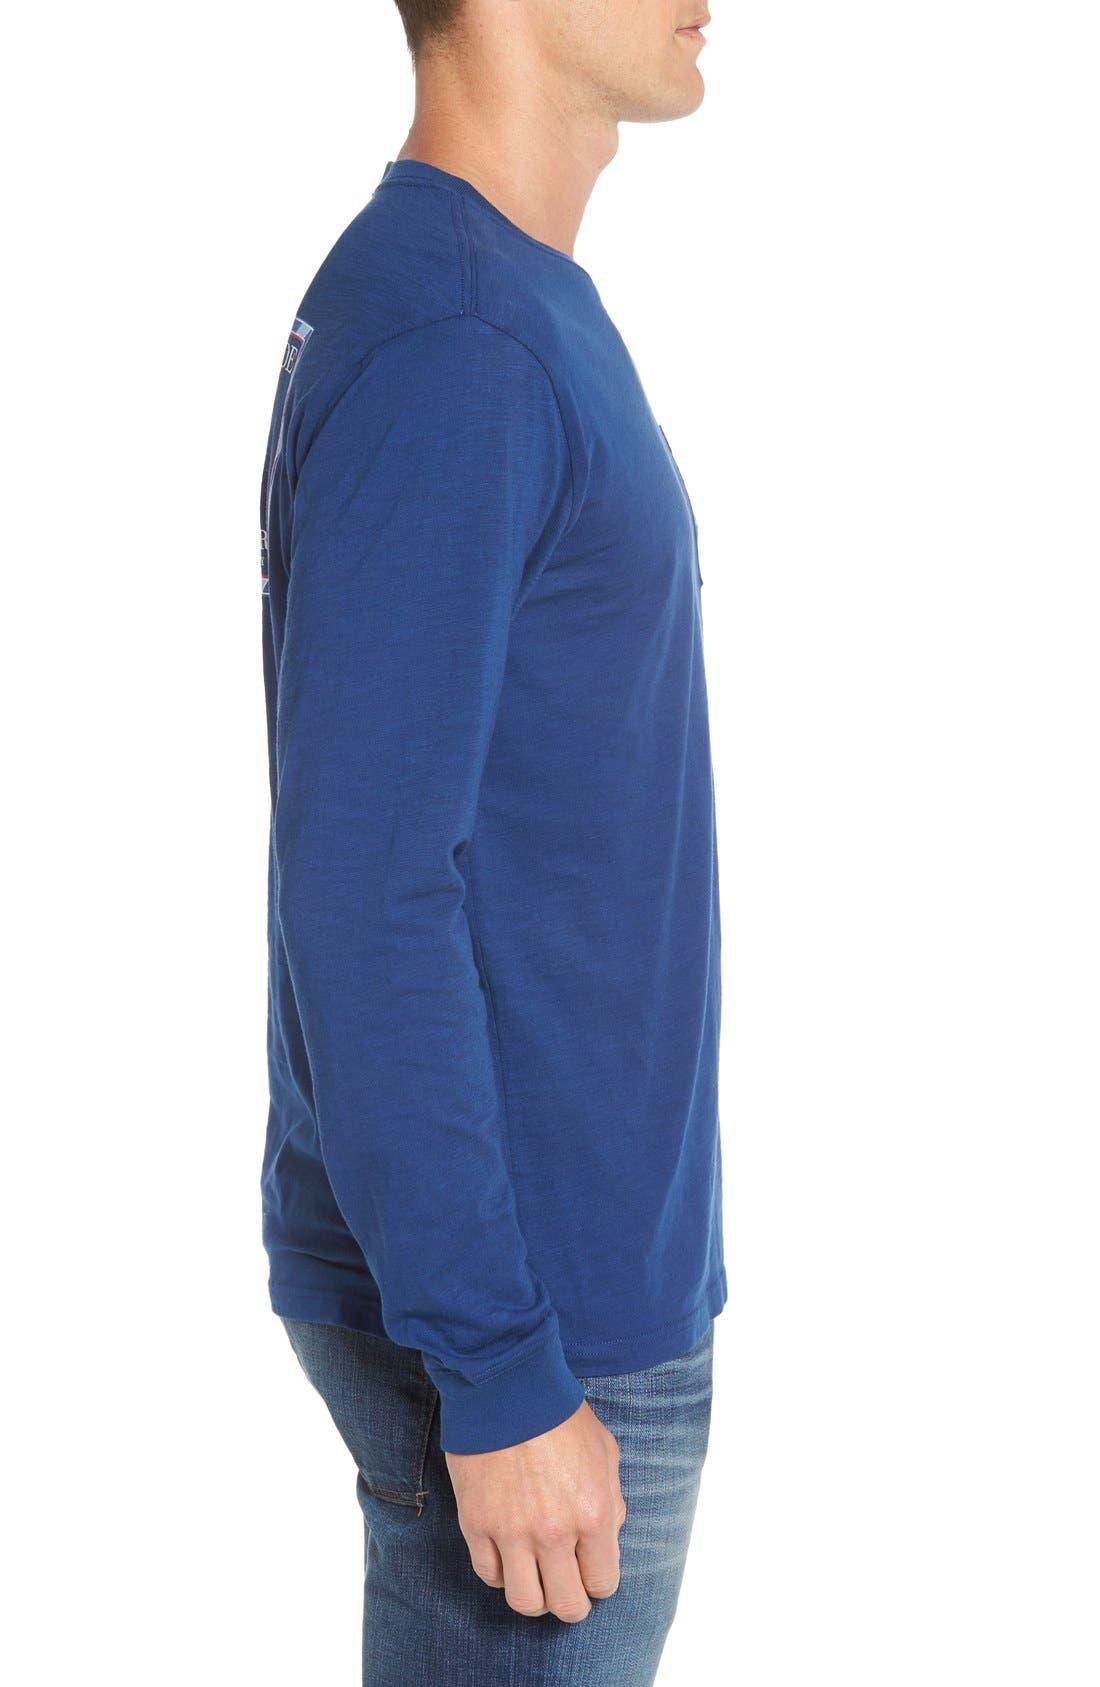 Alternate Image 3  - Southern Tide 'Channel Marker' Graphic Pocket Long Sleeve T-Shirt